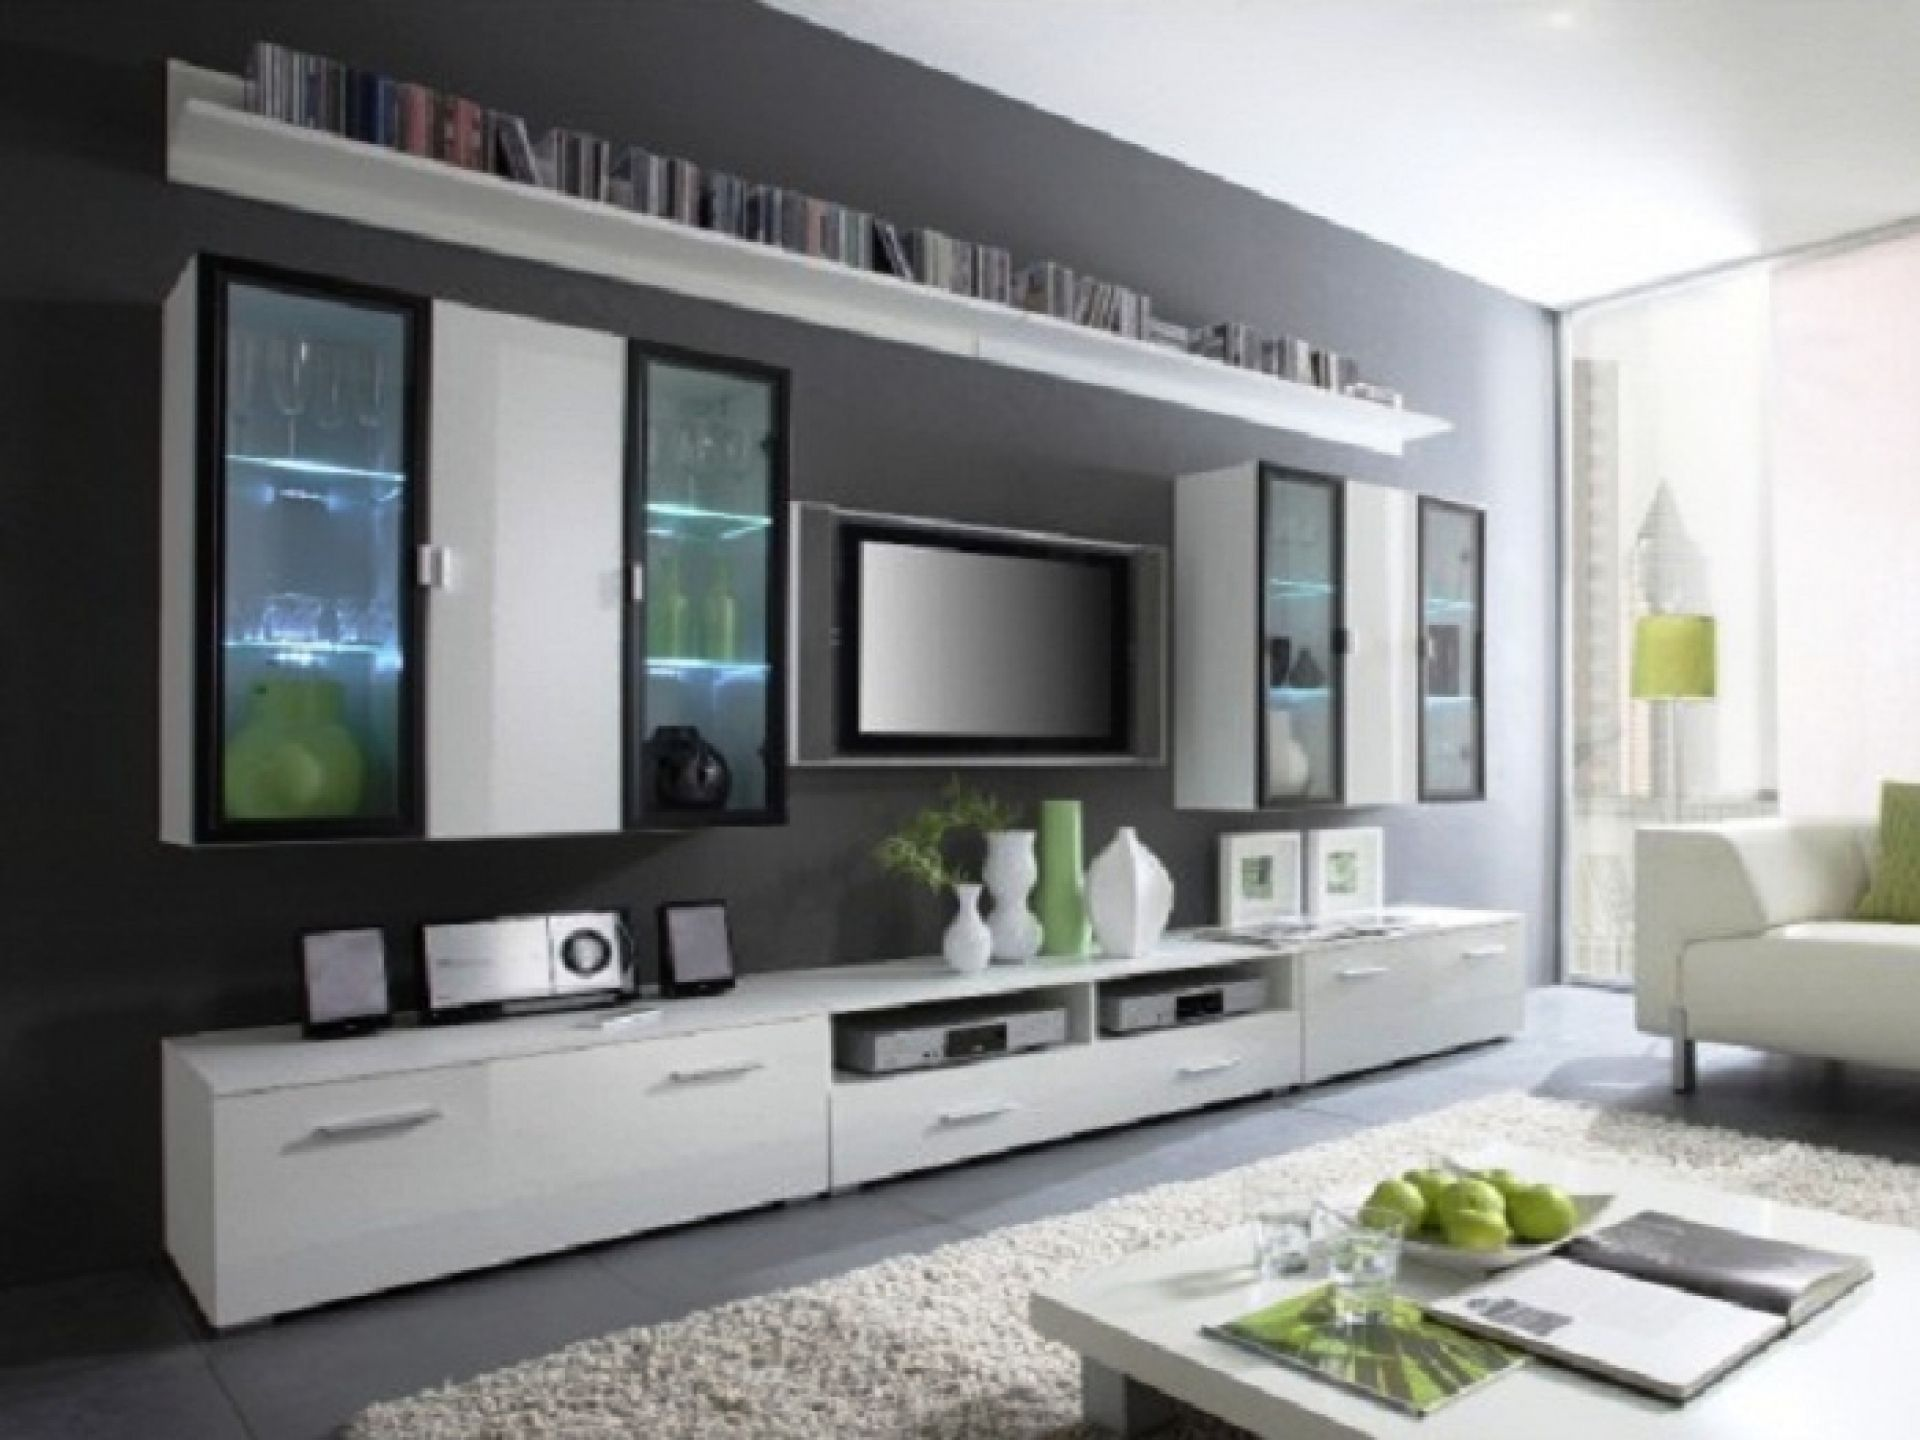 Tv Wall Mount Designs For Living Room  Httpultimaterpmod Pleasing Tv Wall Mount Designs For Living Room Design Ideas